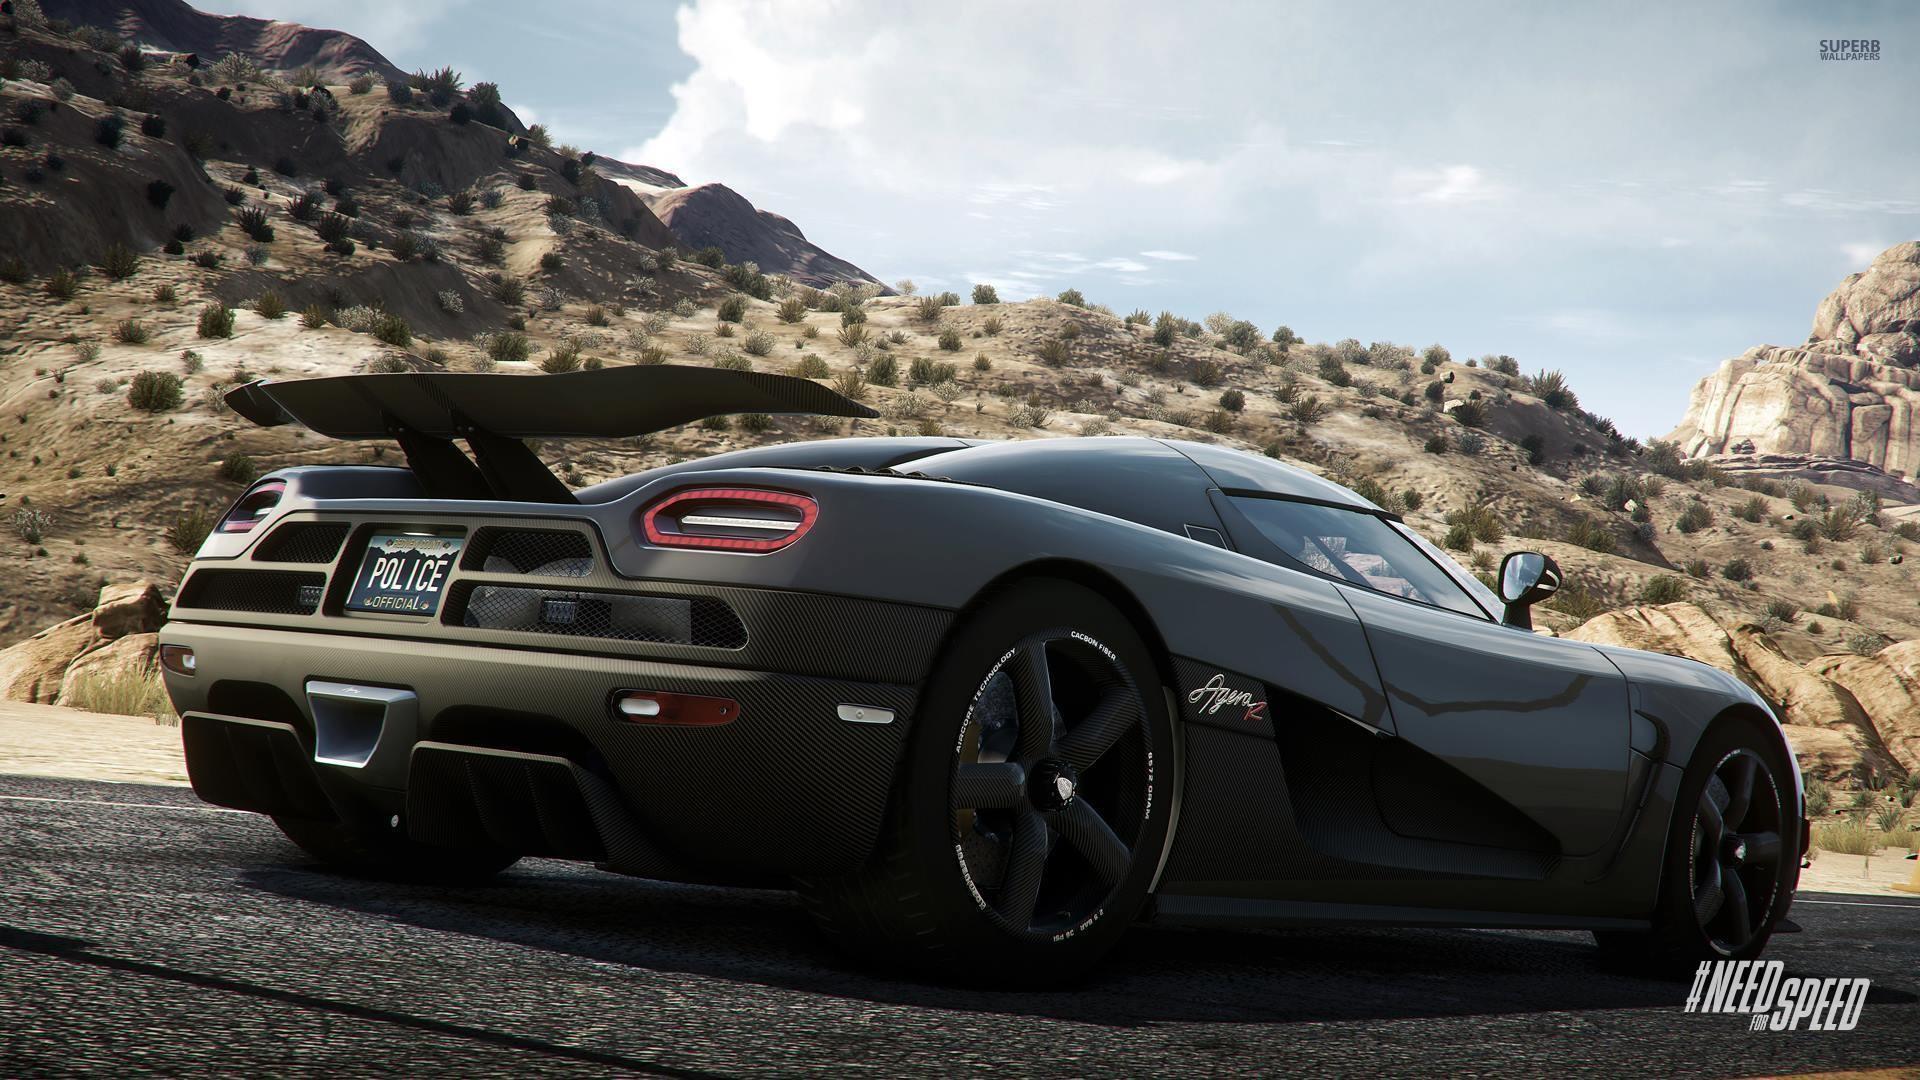 Koenigsegg Agera R Wallpaper 1080p 71 Images